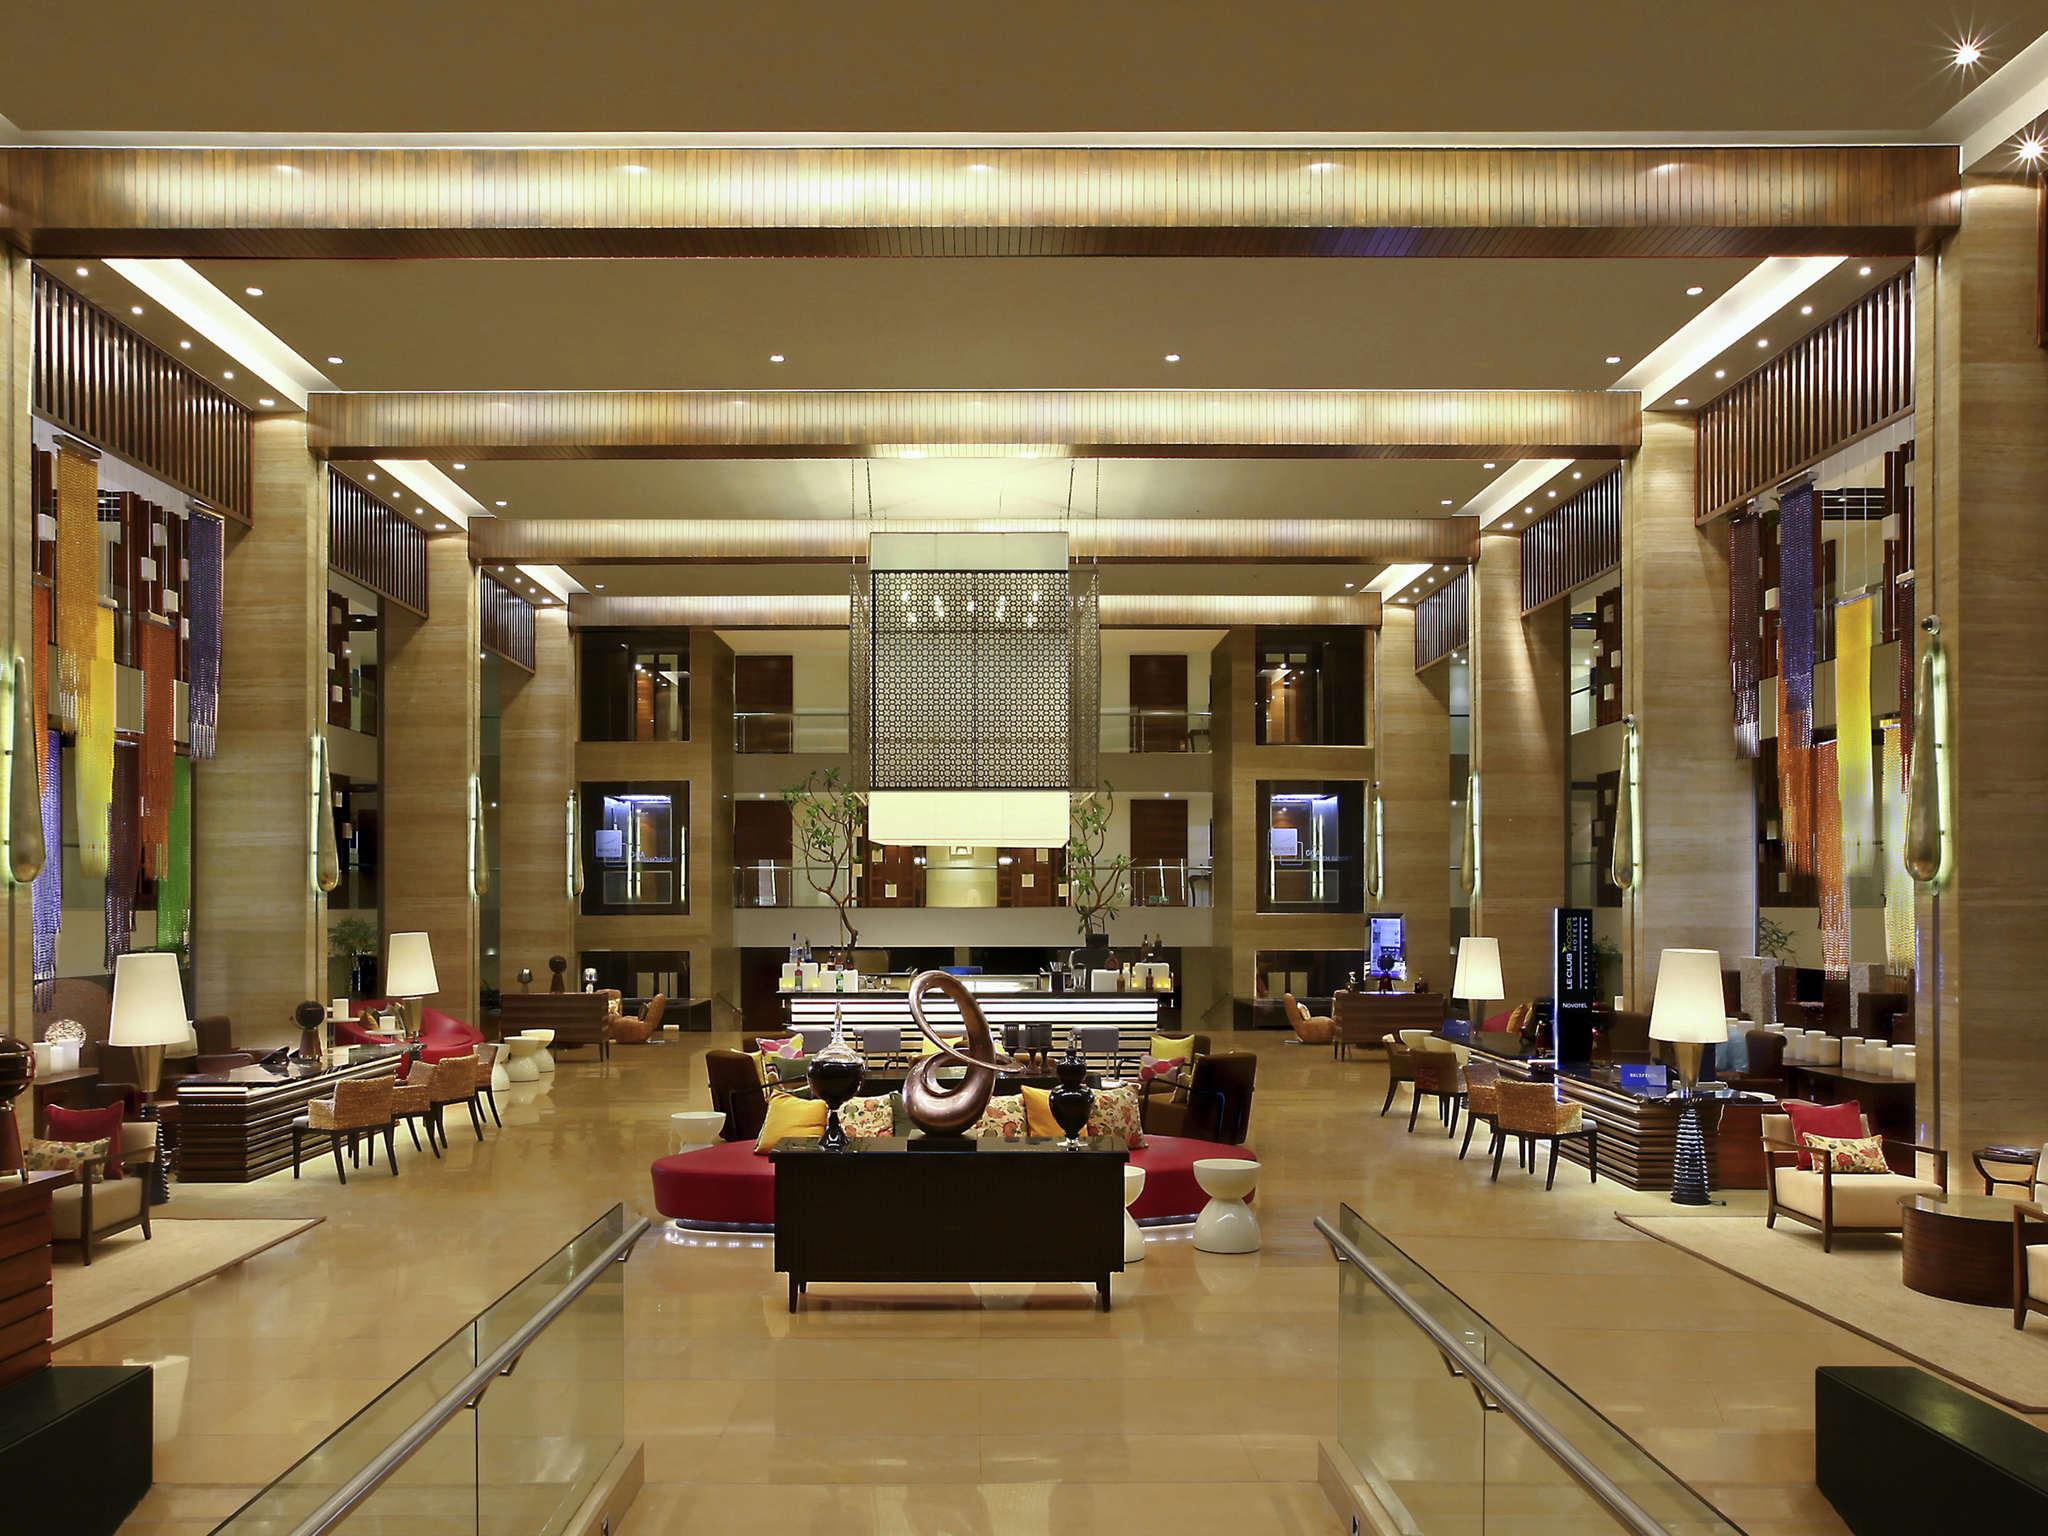 Hotel Novotel Goa Shrem Rooms